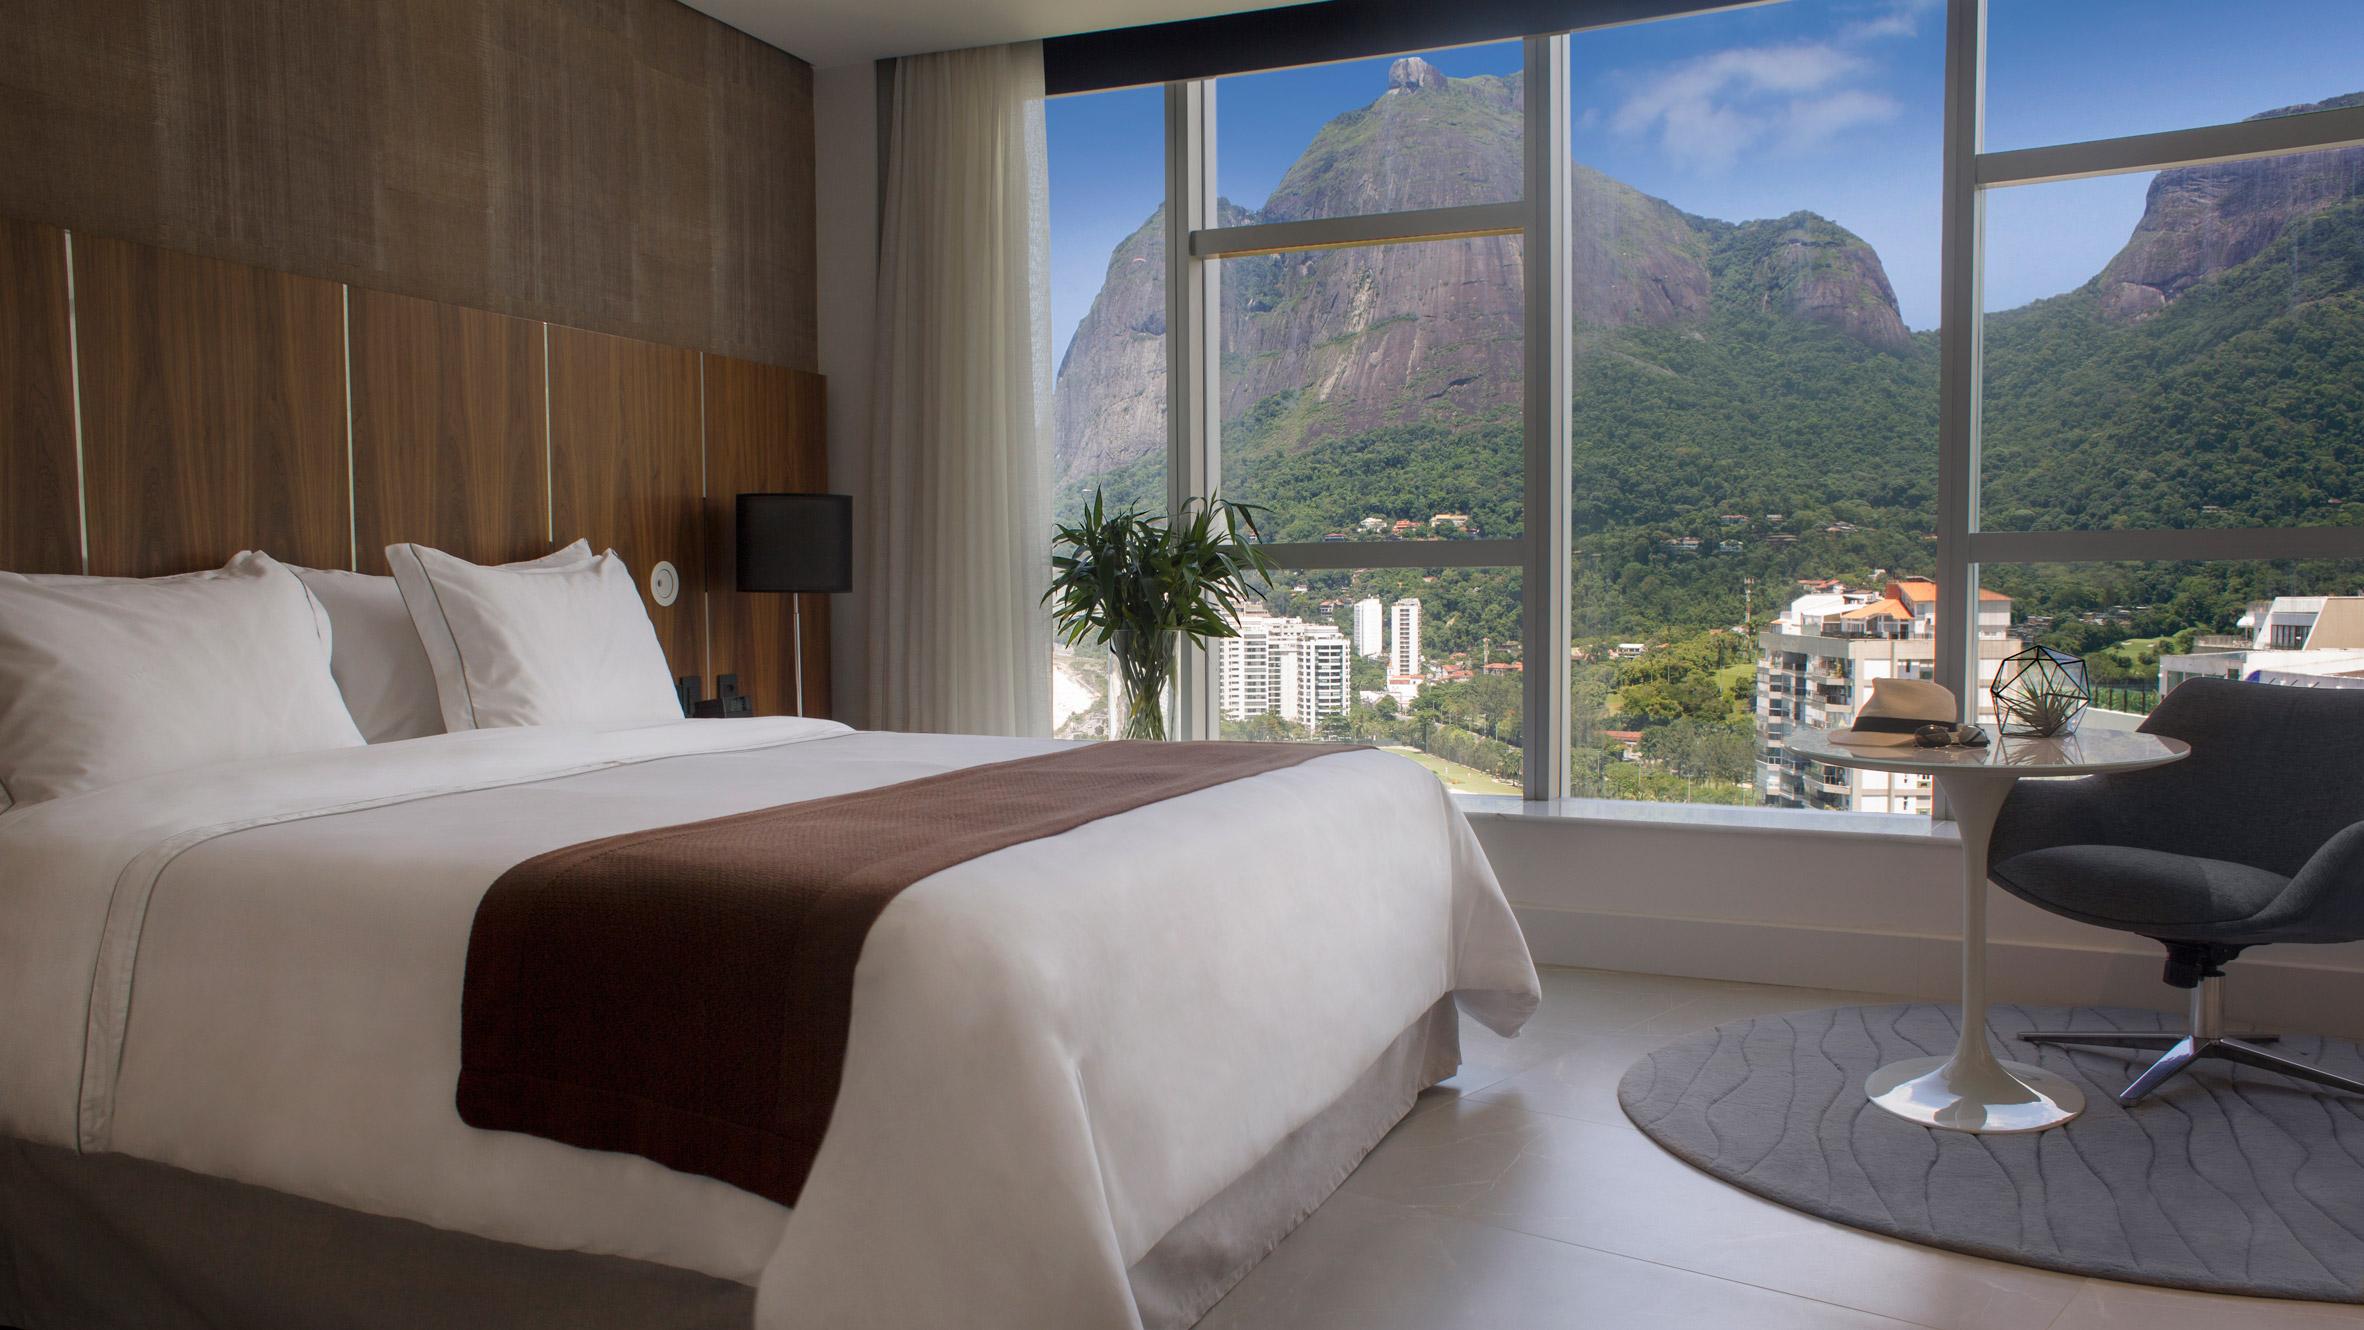 hotel-nacional-oscar-niemeyer-renovation-interiors-rio-news_dezeen_2364_hero